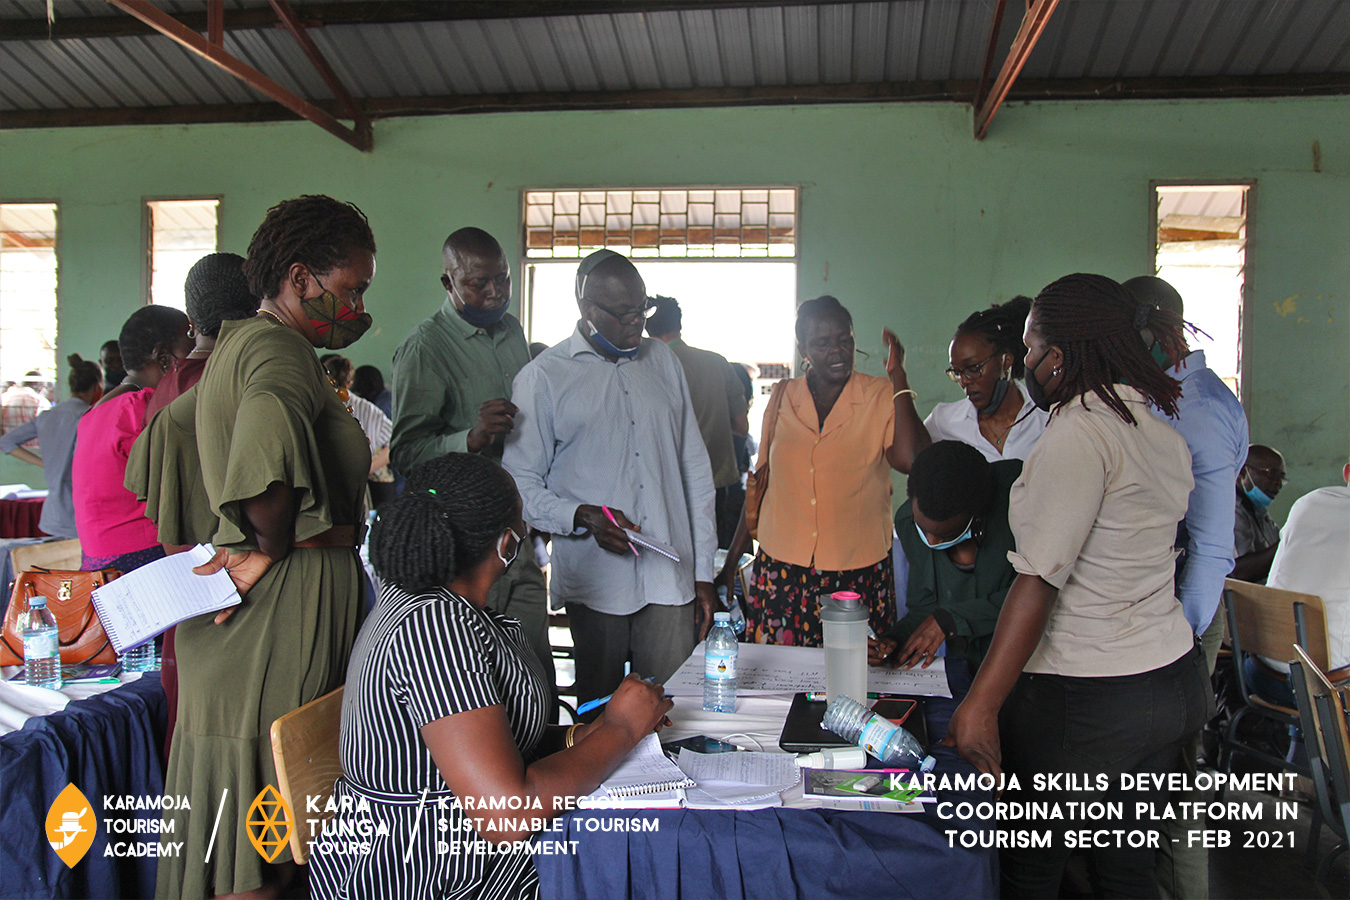 kara-tunga-karamoja-tourism-academy-stakeholder-meeting-2021-12